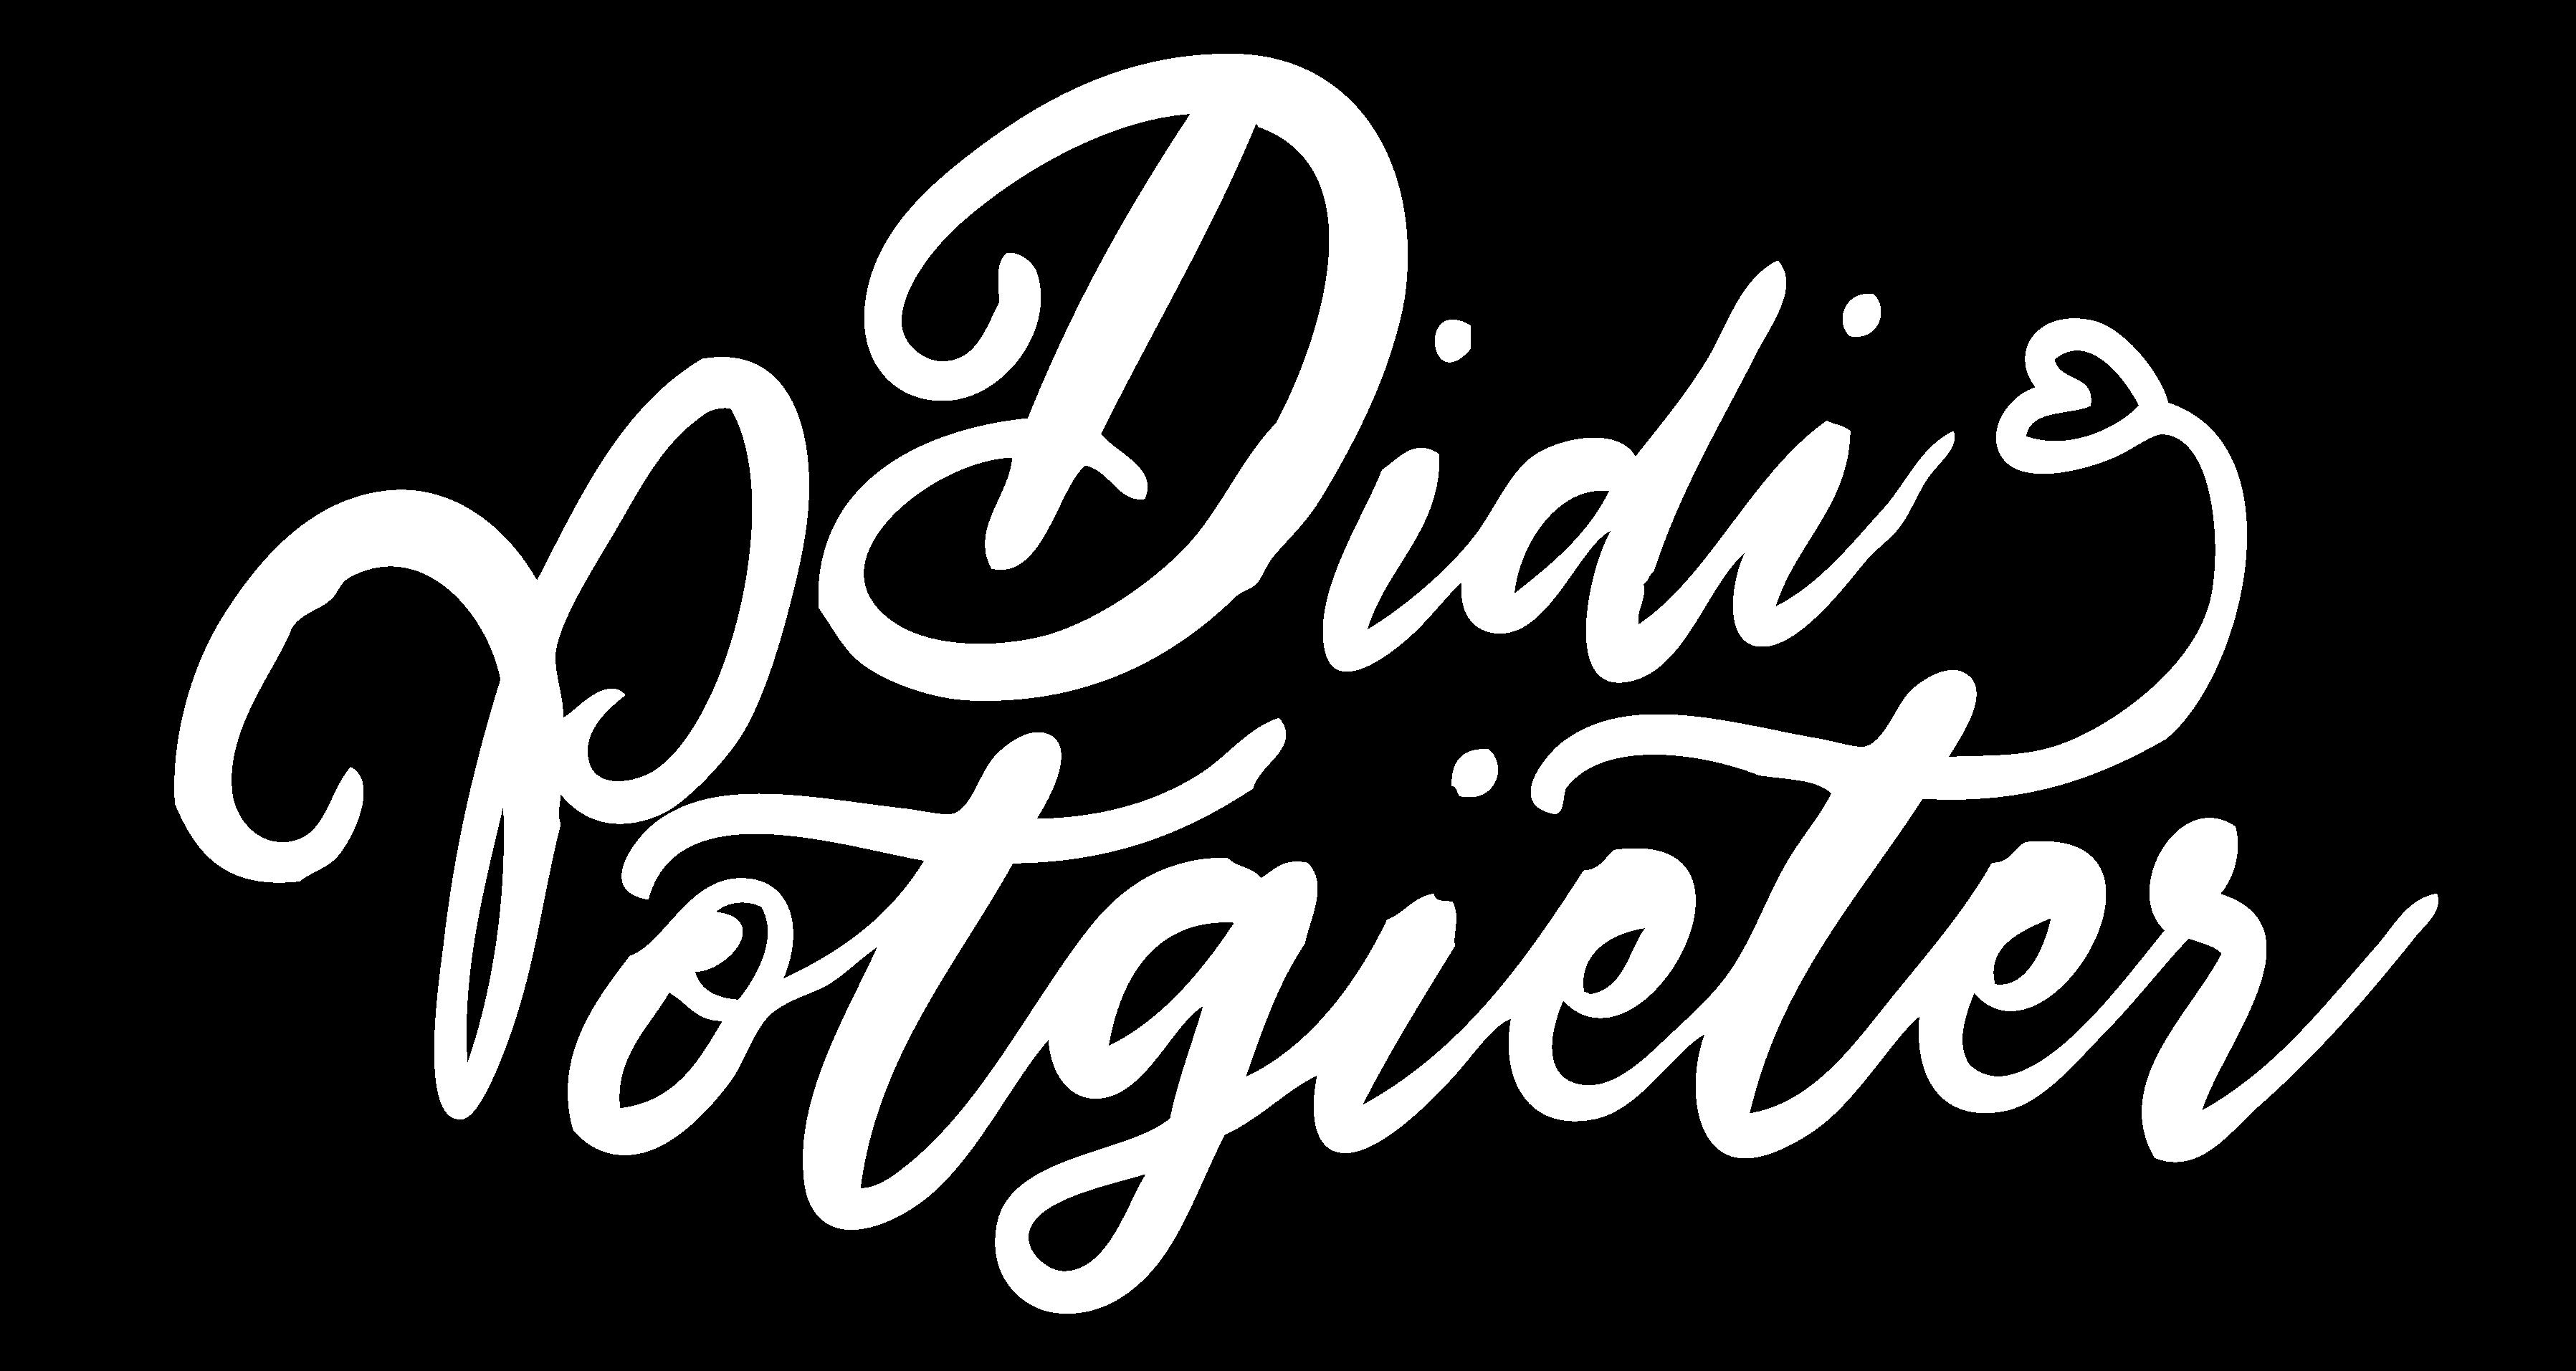 Didi Potgieter